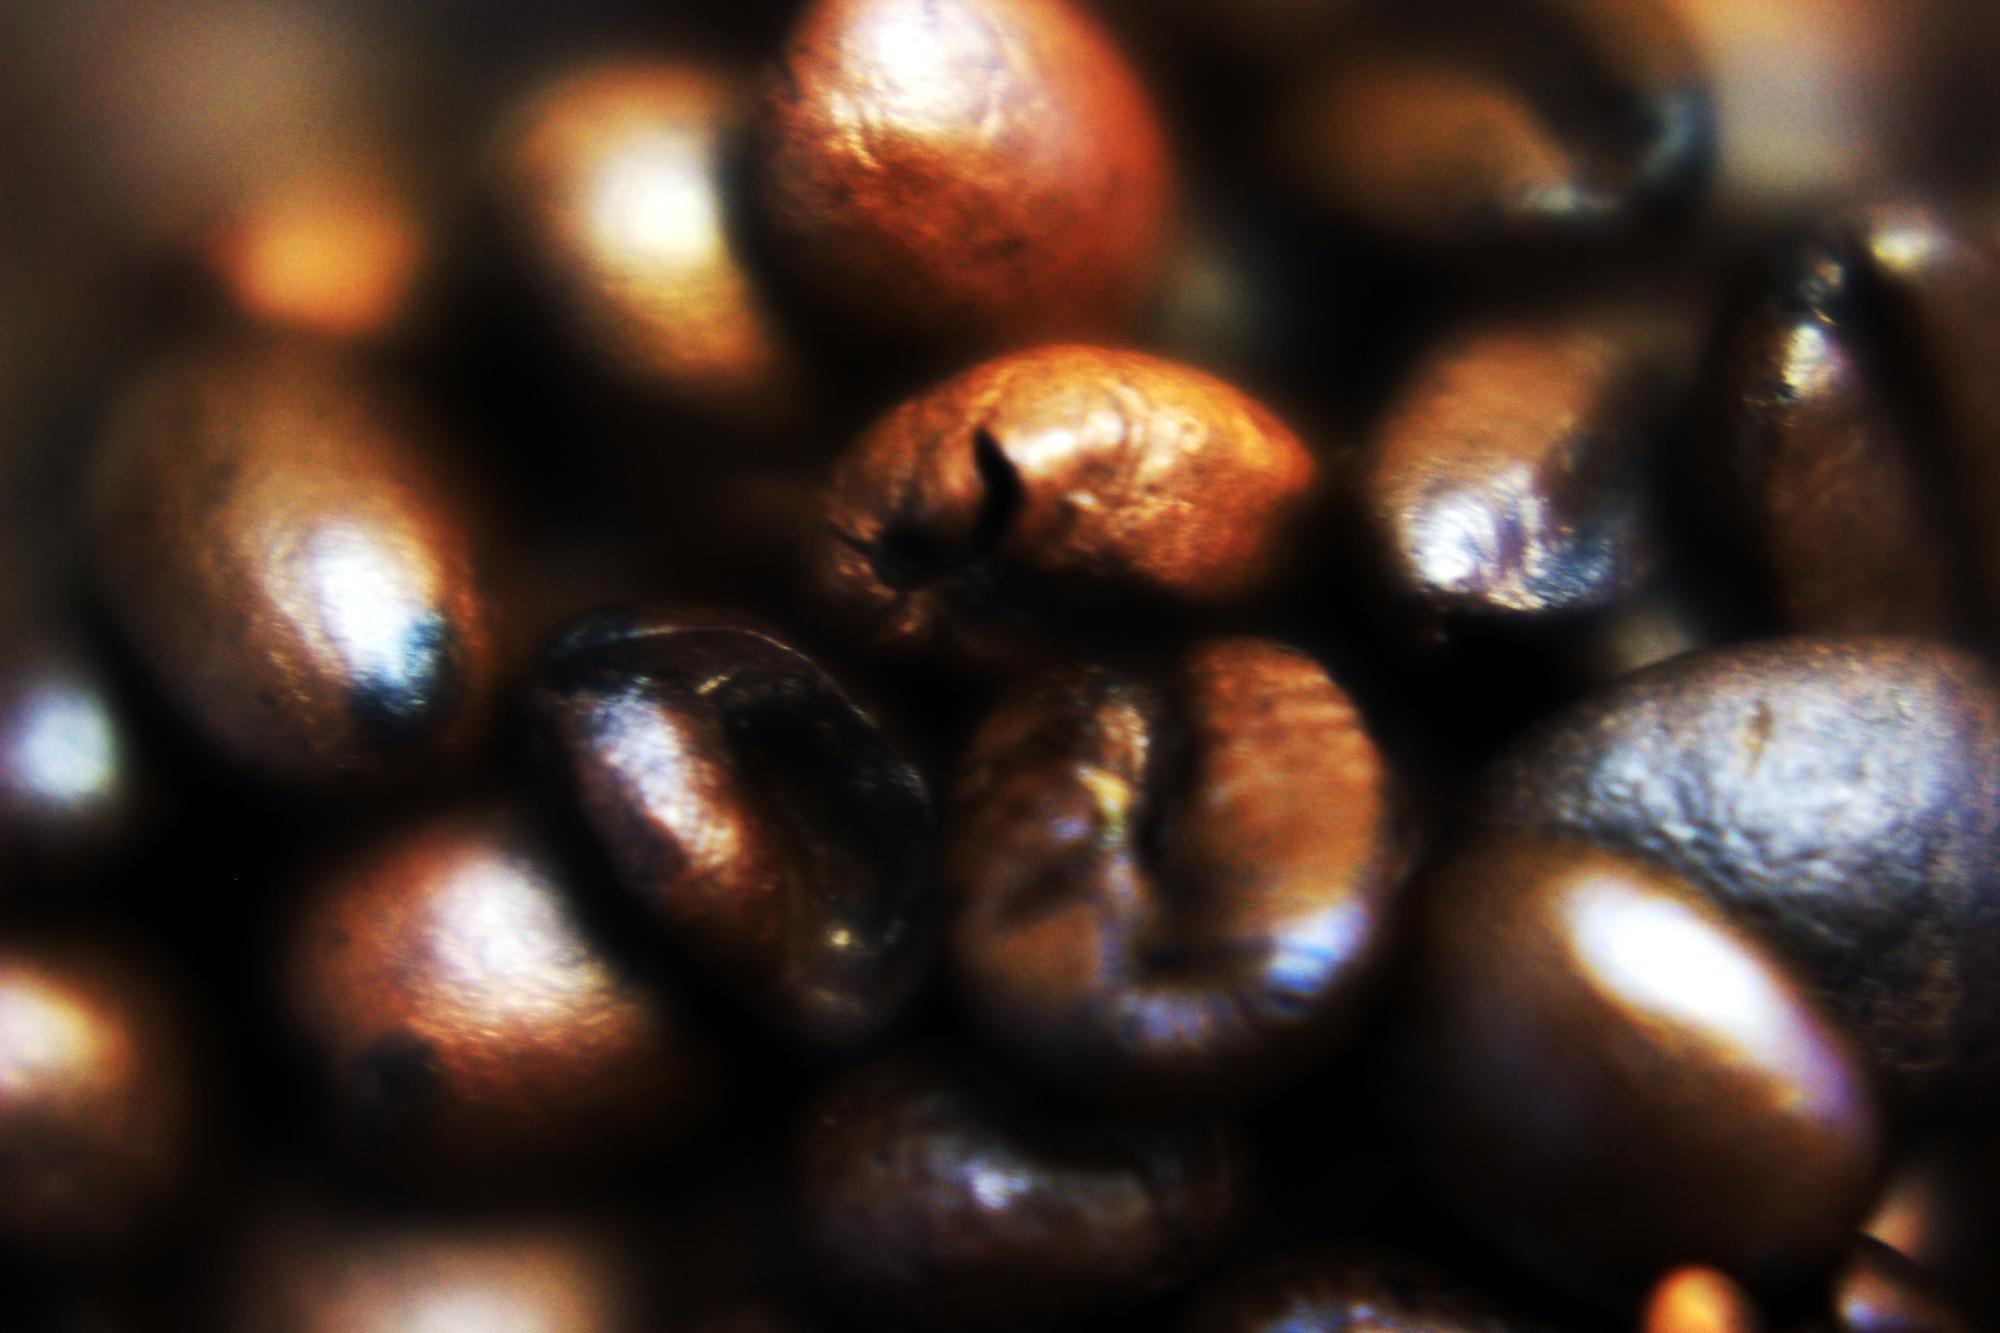 Coffee beans (macro)